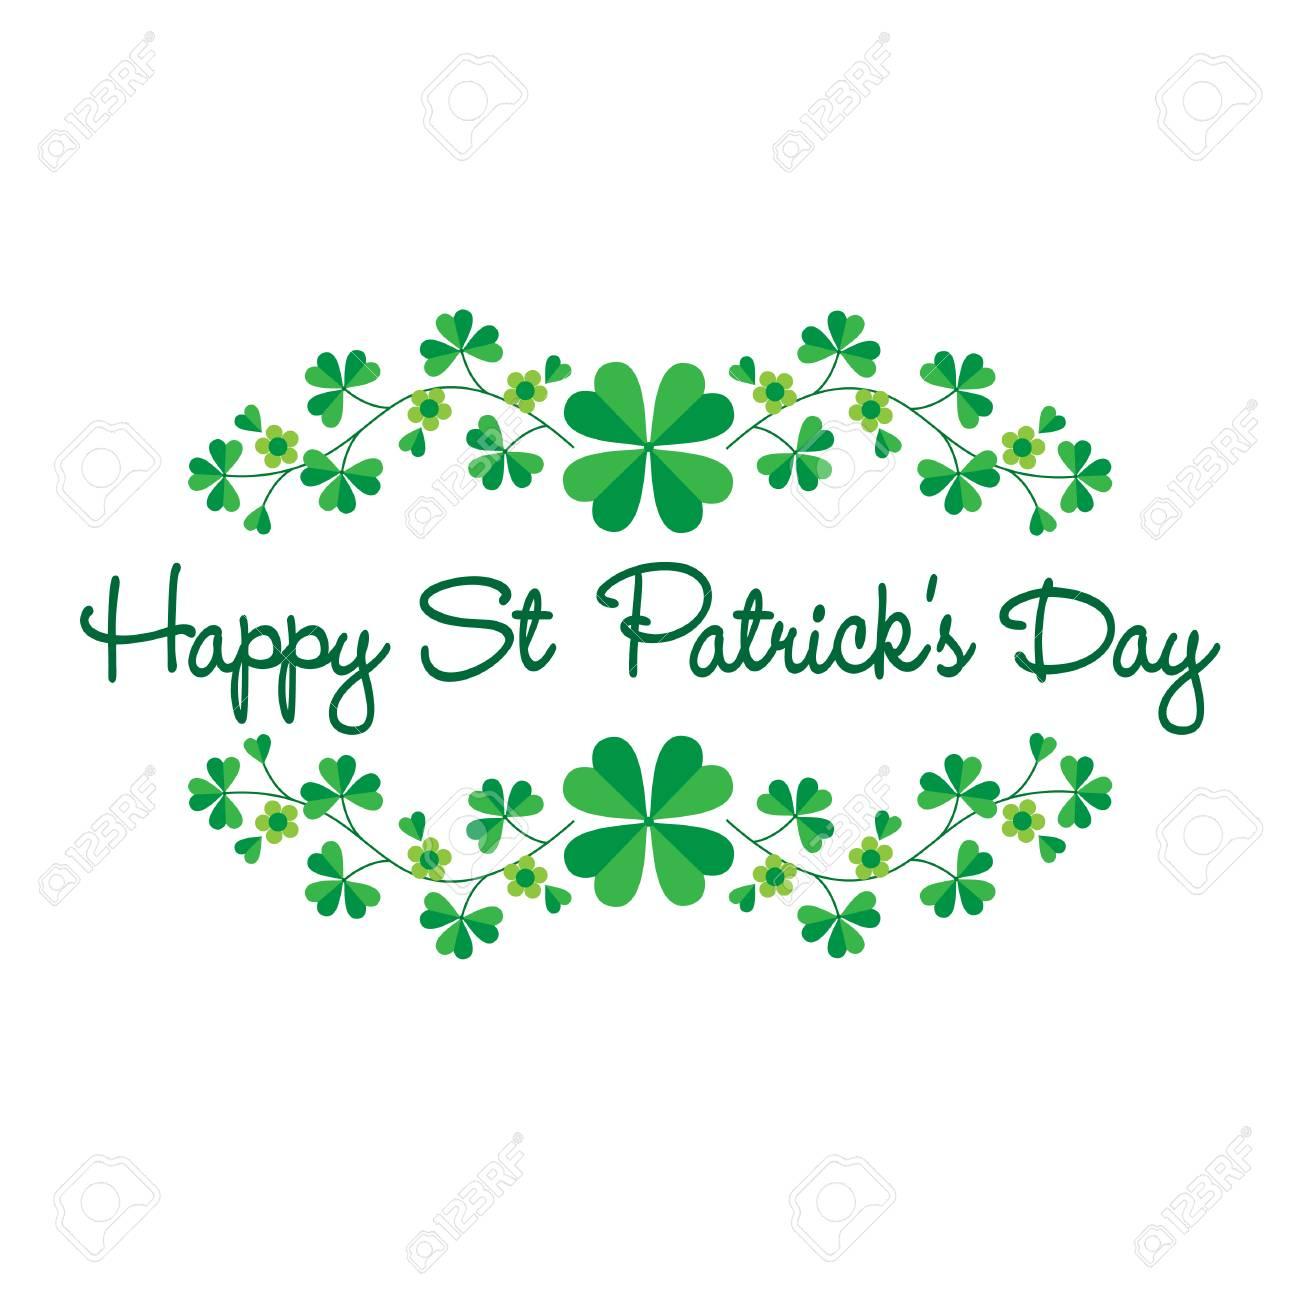 Saint Patricks Day graphic with border pattern - 95926454